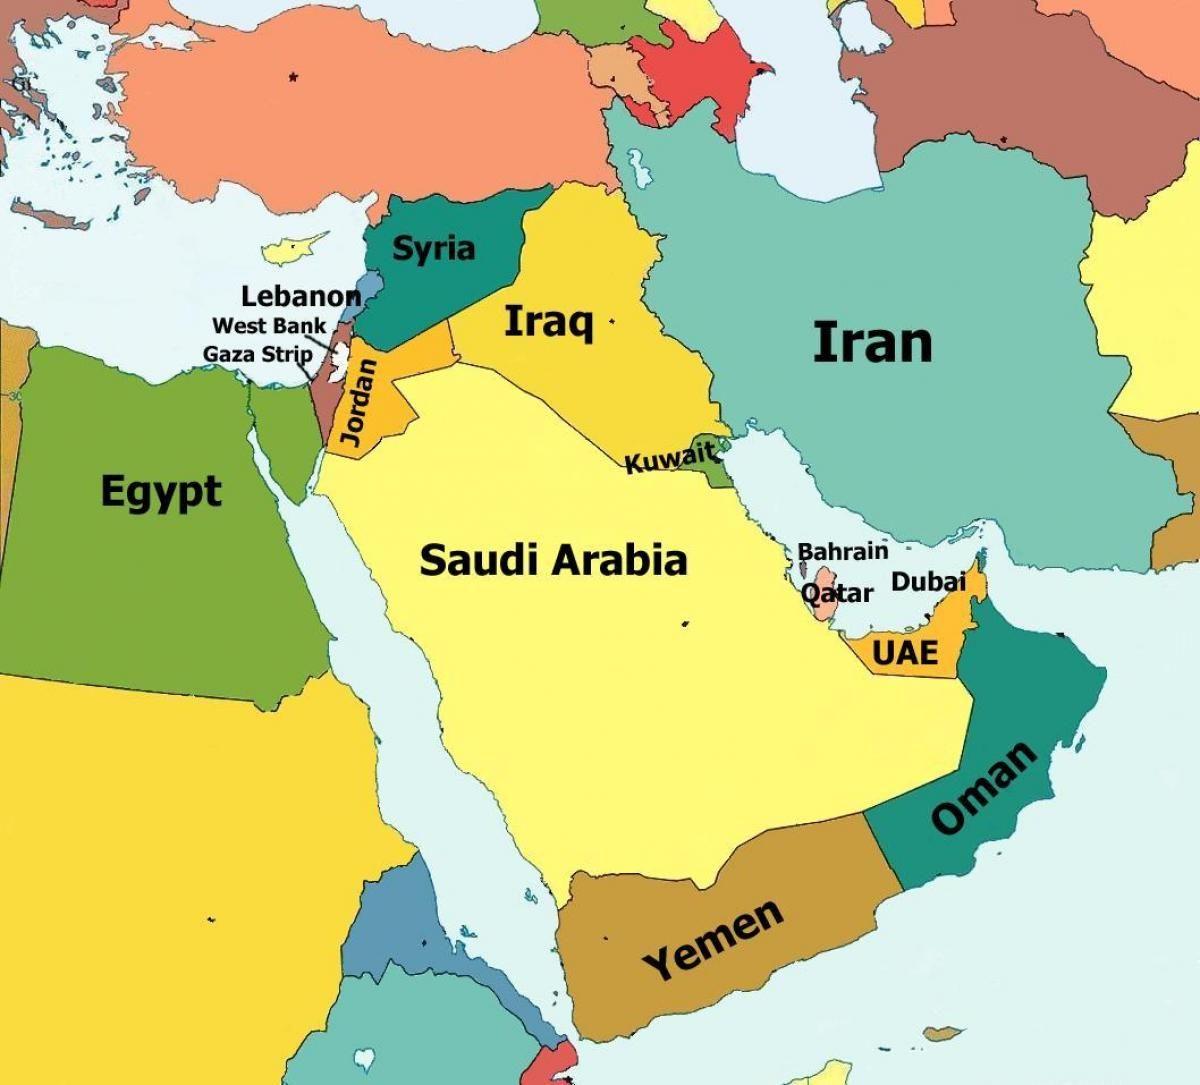 Abu Dhabi World Map Dubai On World Map And Of WORLD MAPS In | Dubai map, Dubai, Map